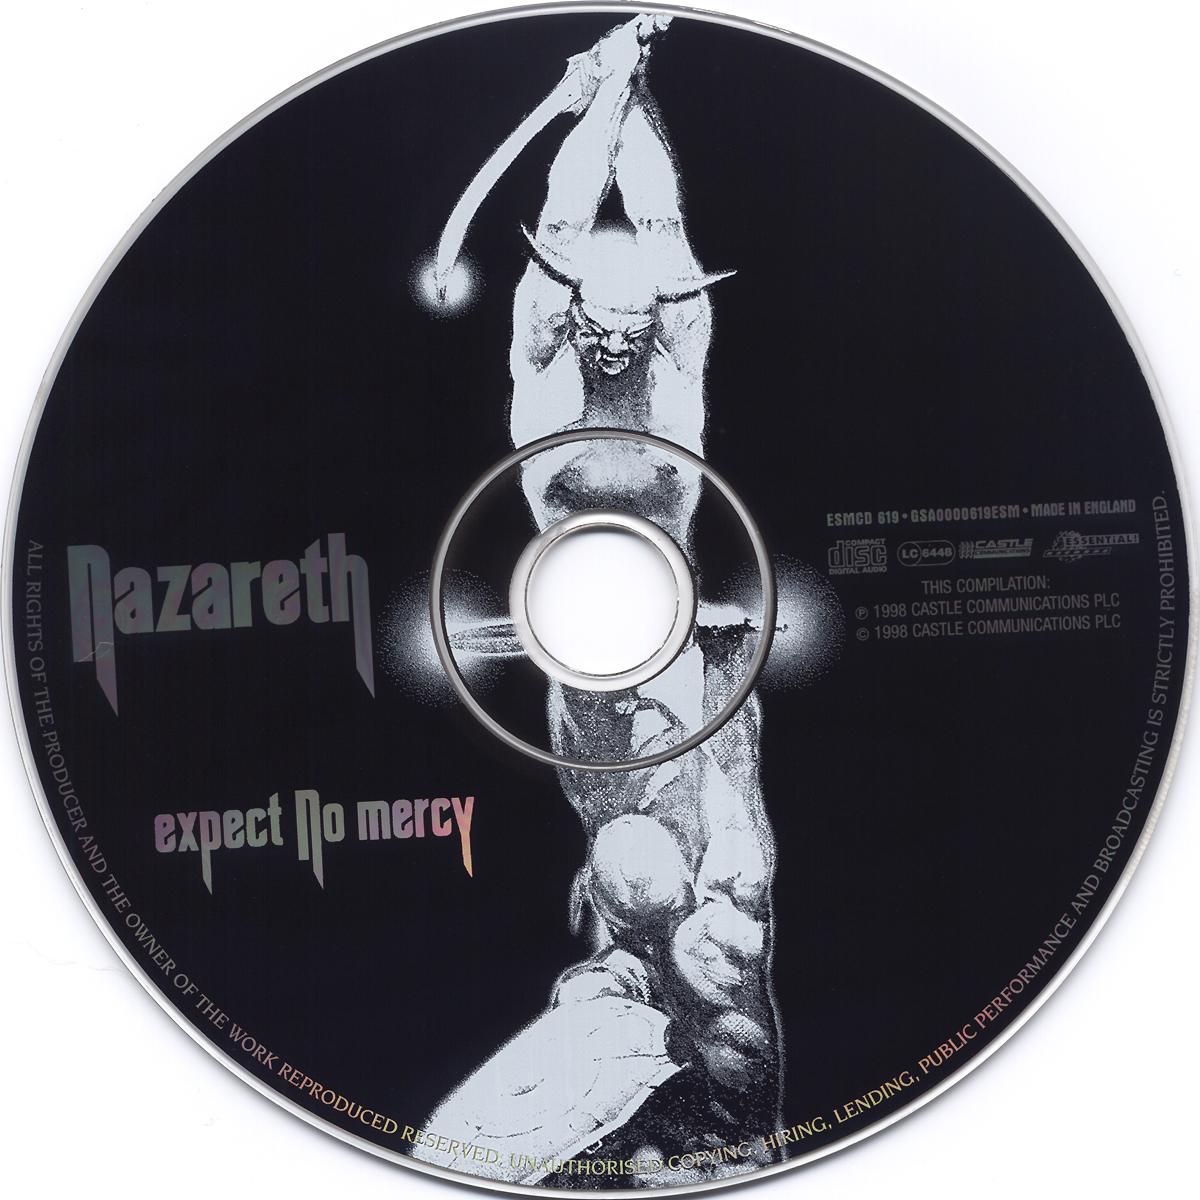 Musicotherapia: Nazareth - Expect No Mercy (